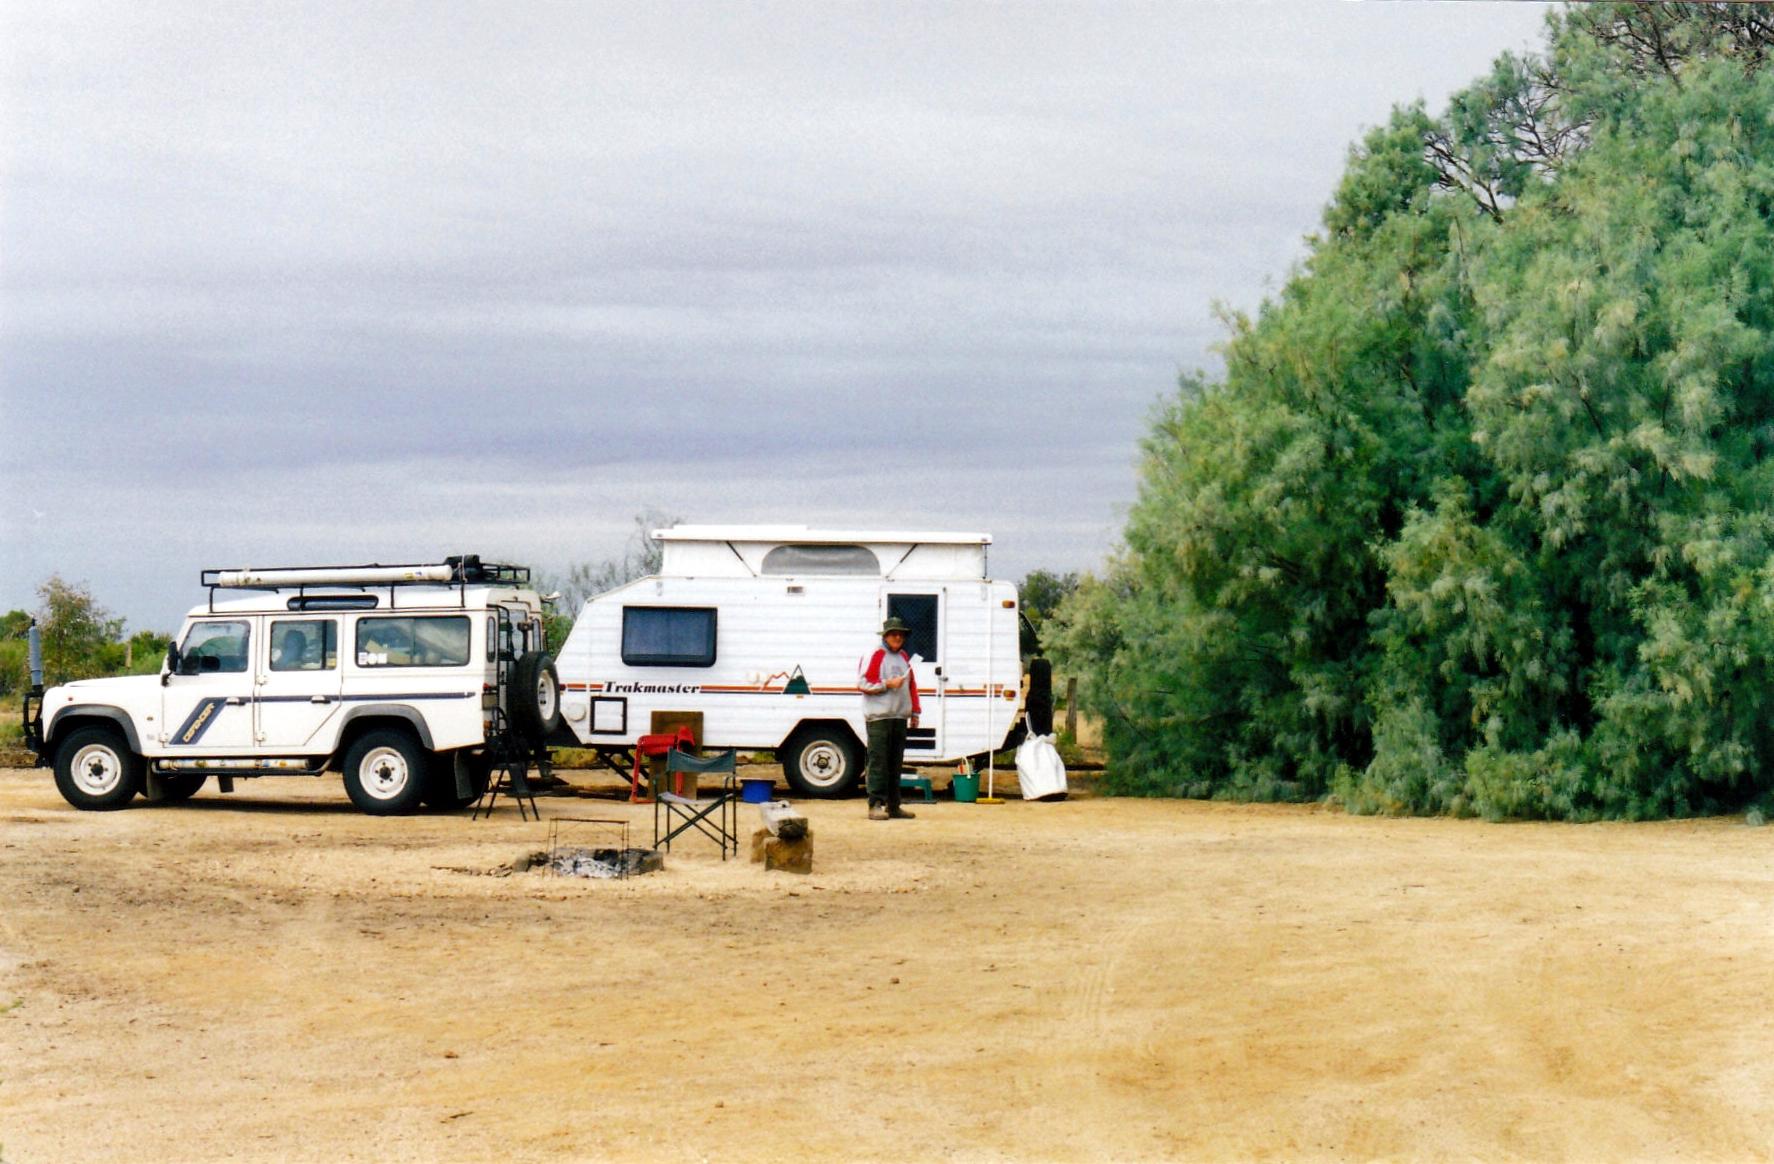 05-26-1999 09 camp at coward springs